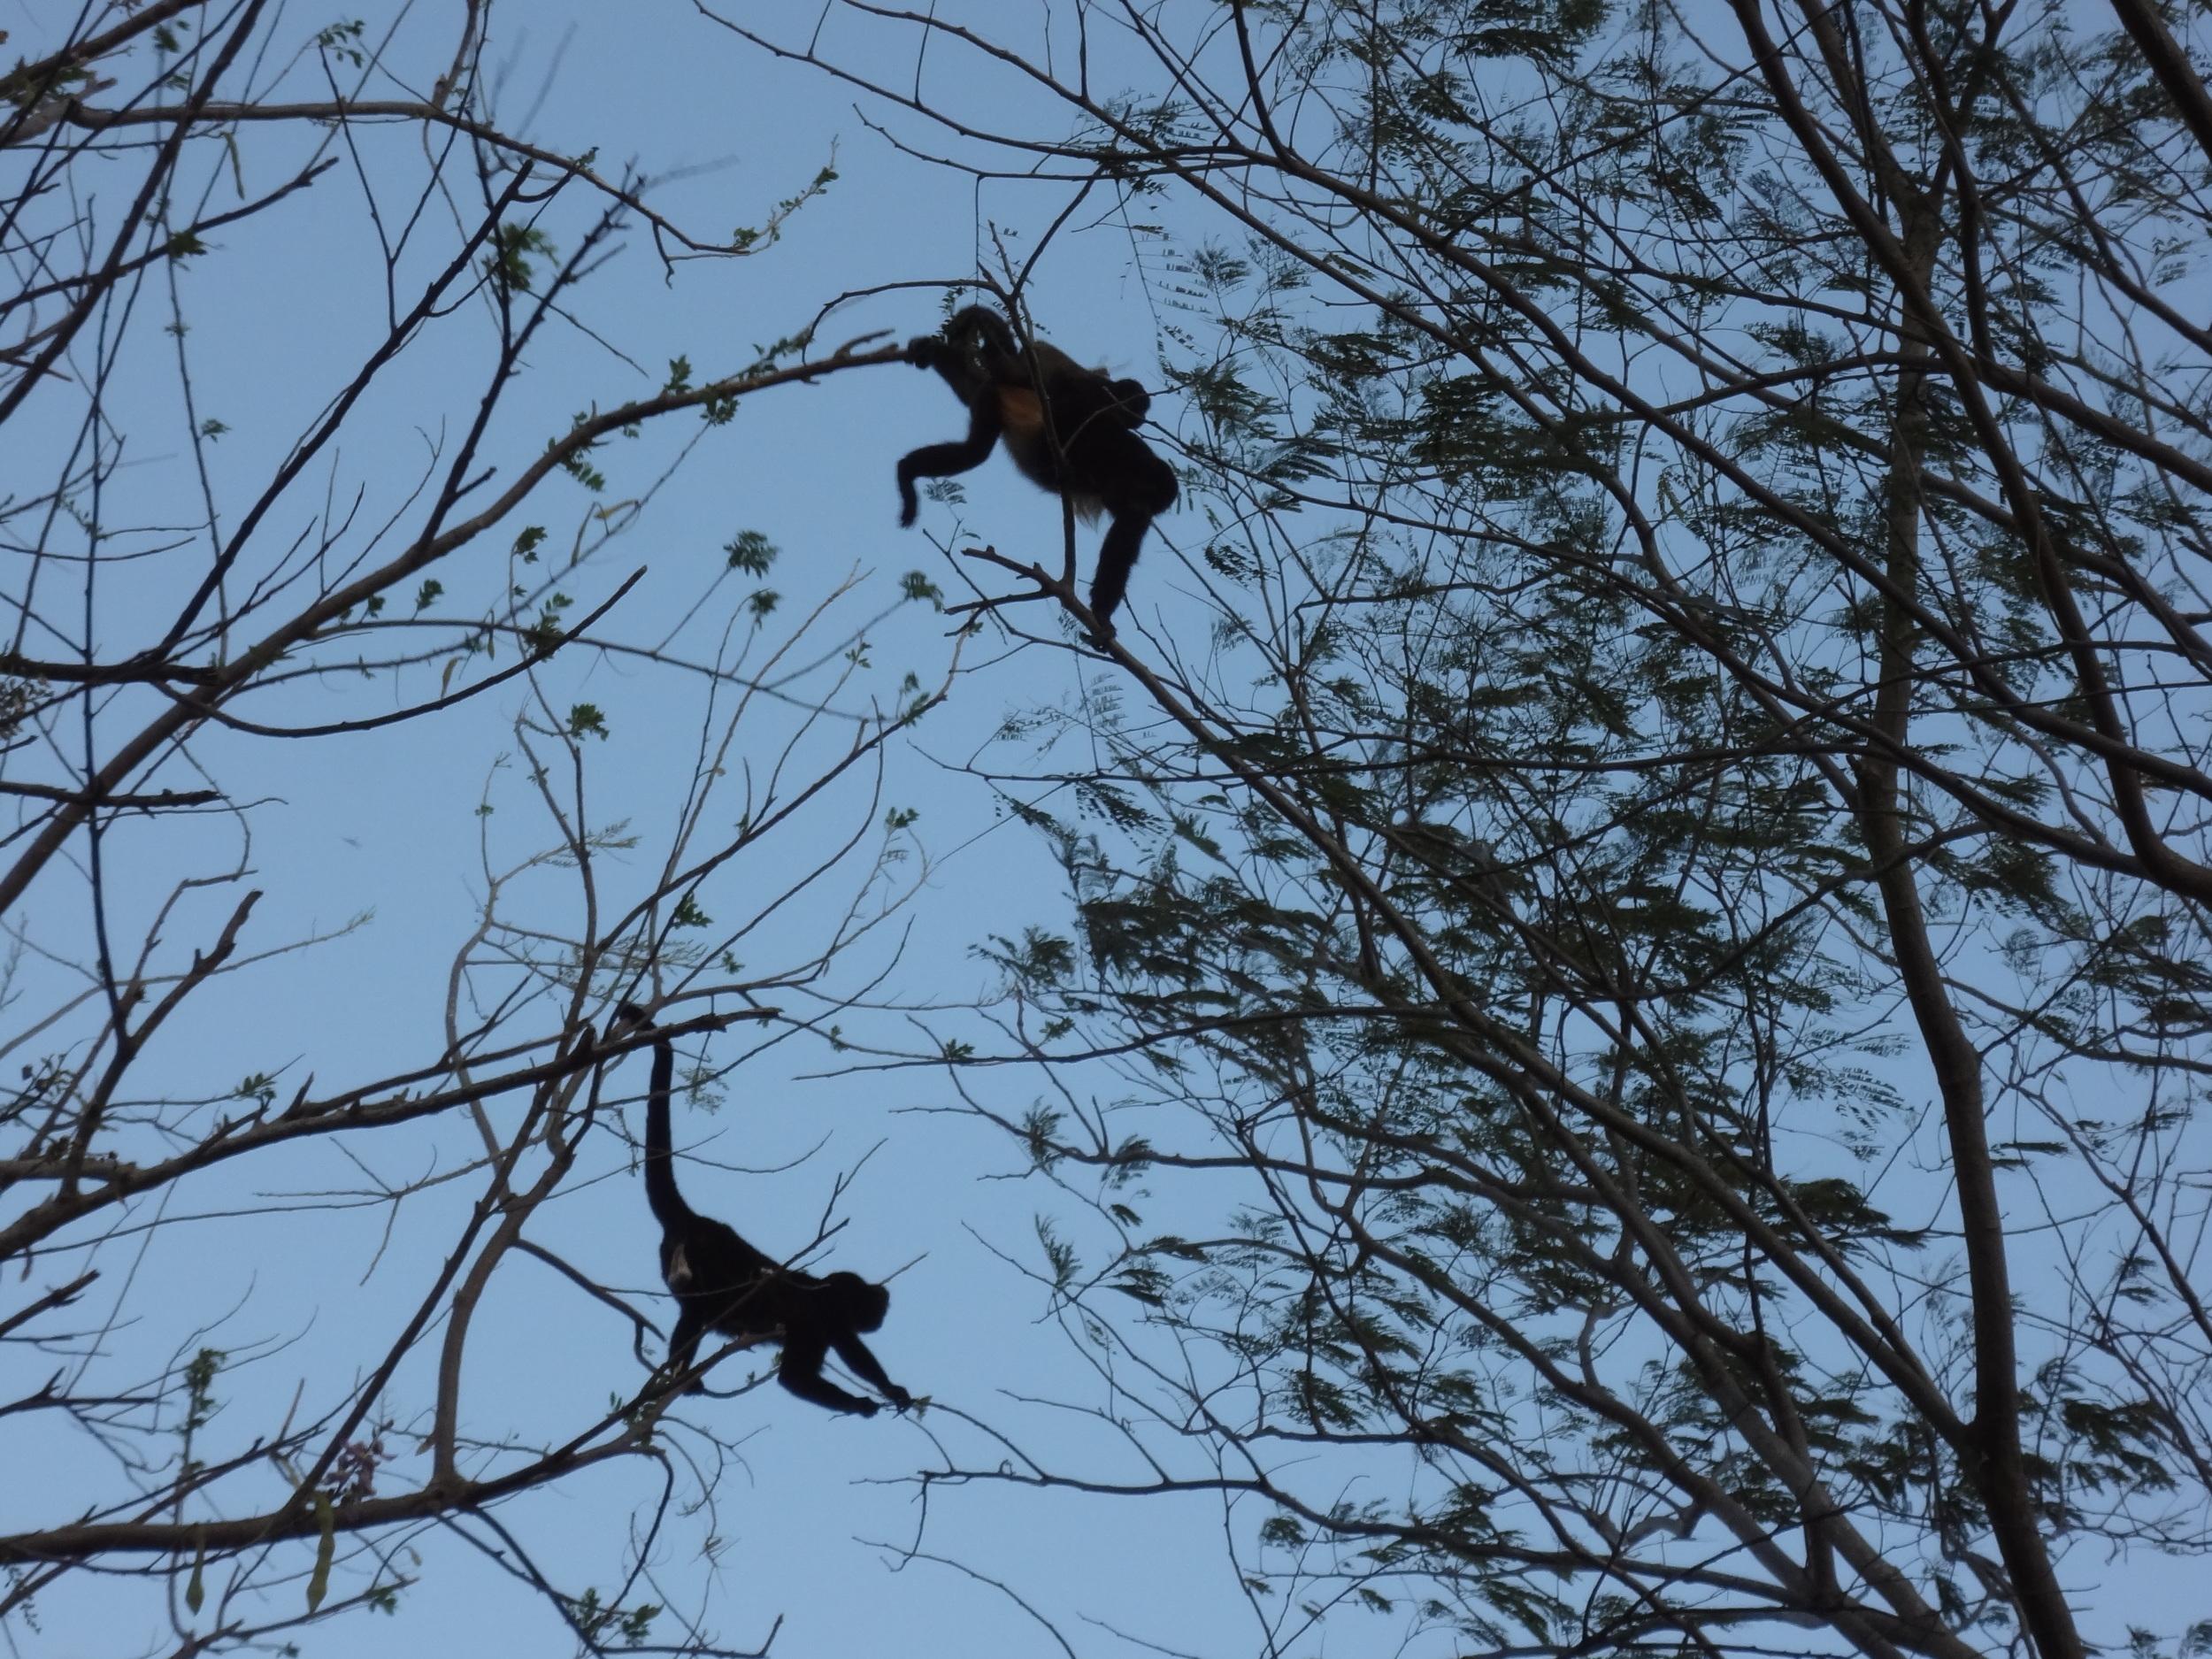 Monos locos. These little howler monkeys sound like 400lb gorillas!